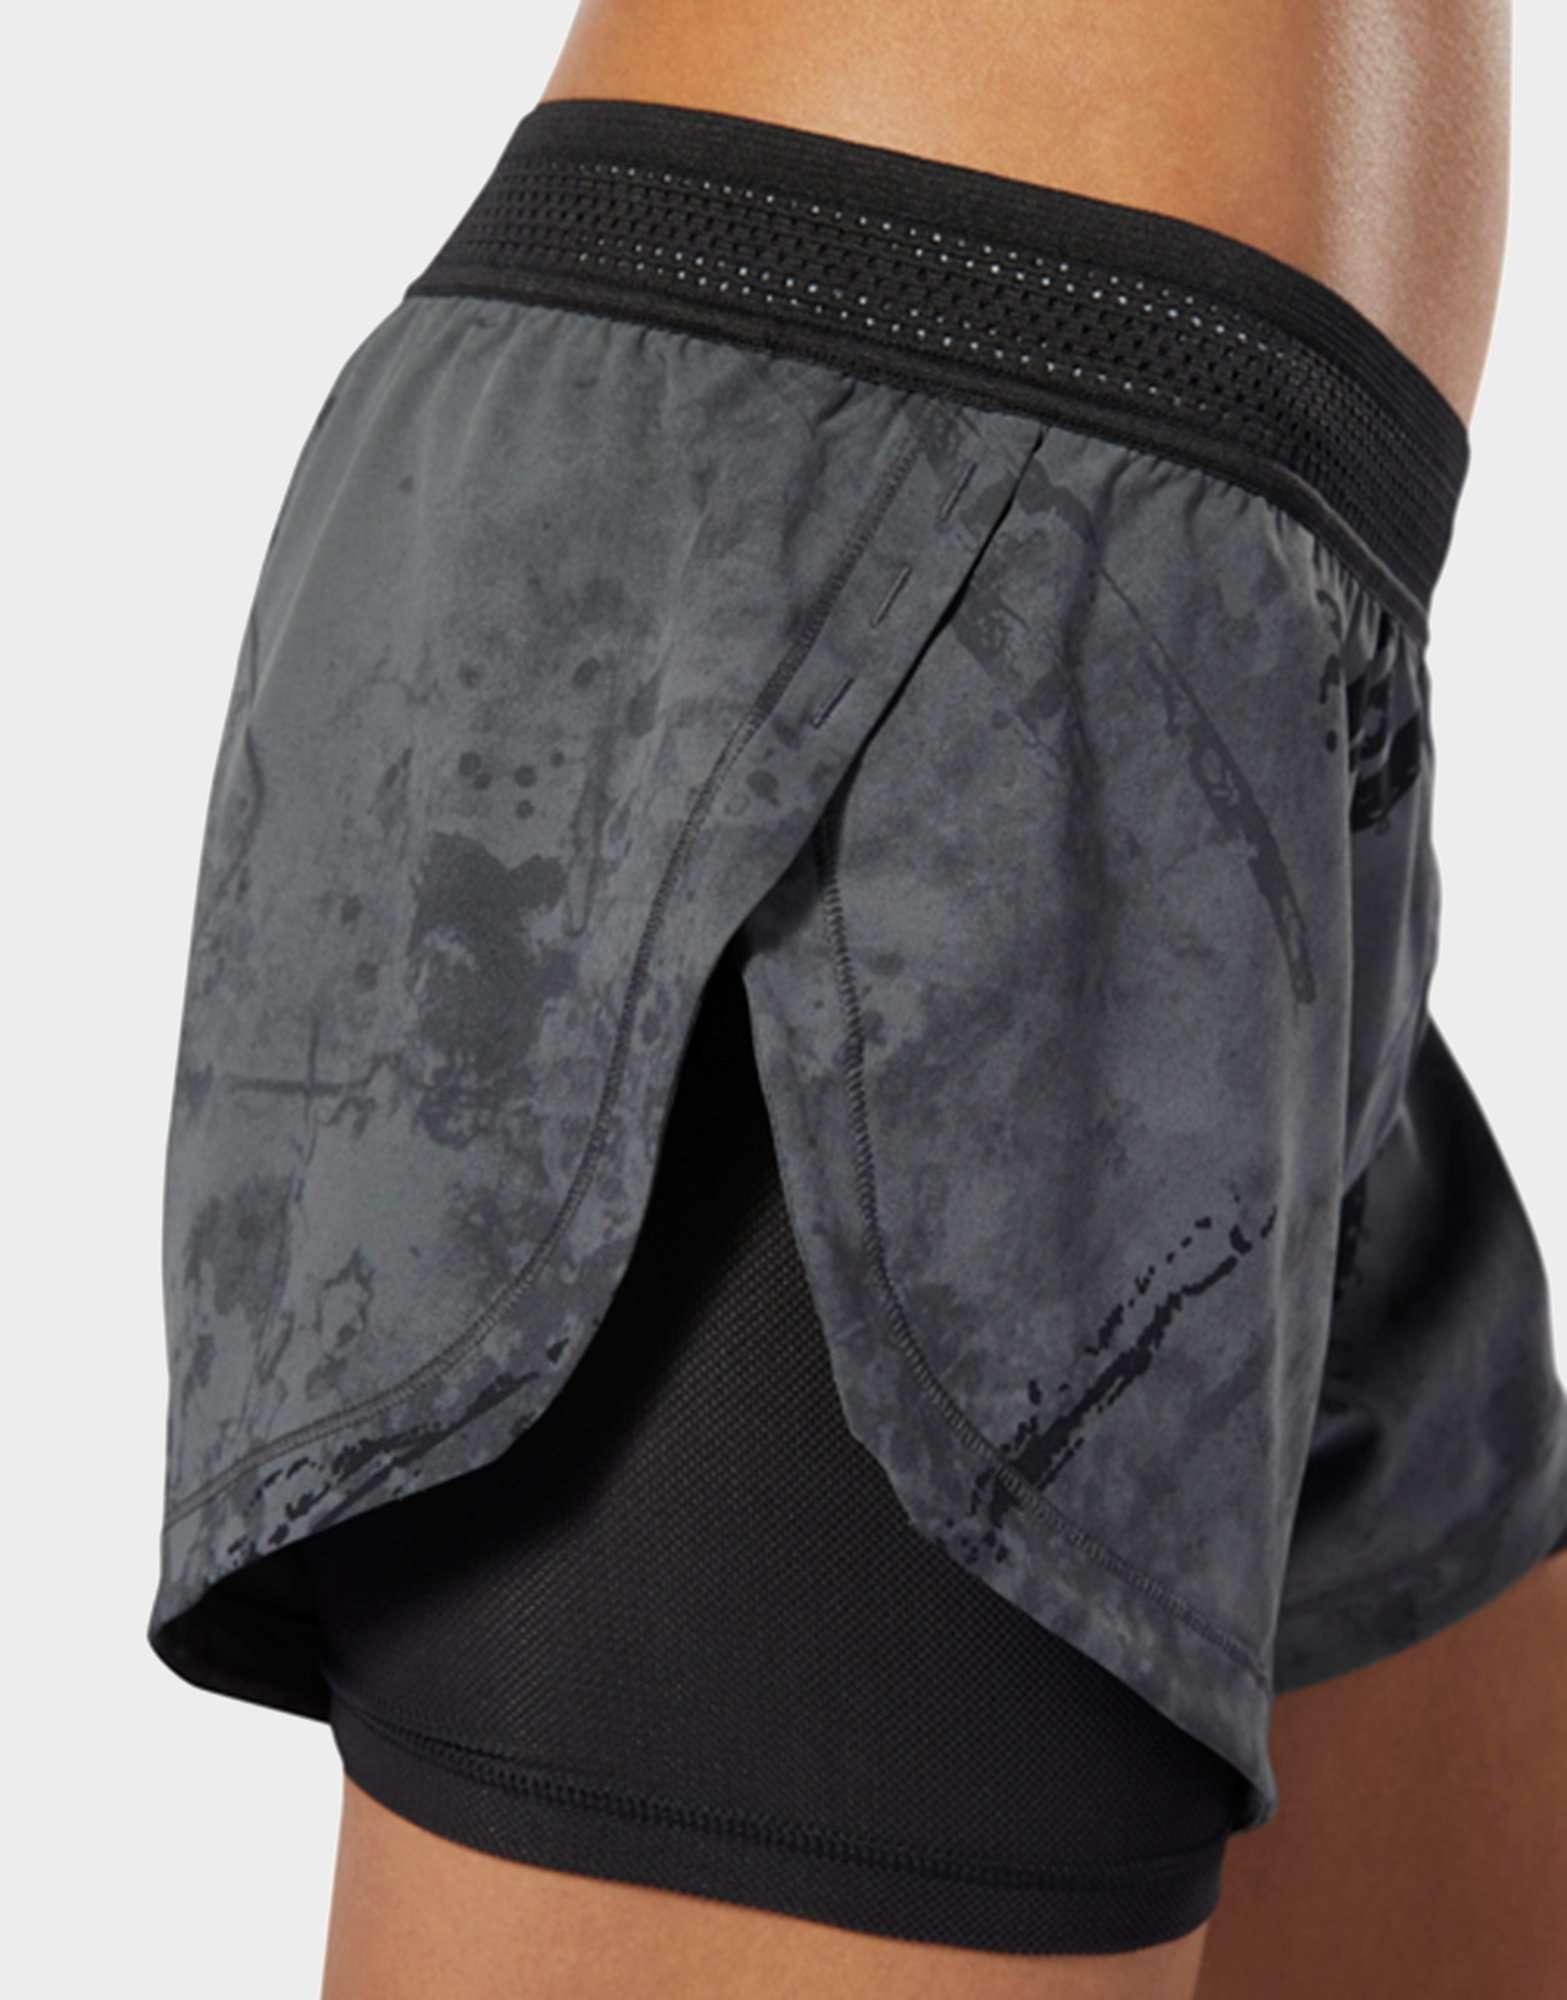 REEBOK Combat Epic Kickboxing Shorts